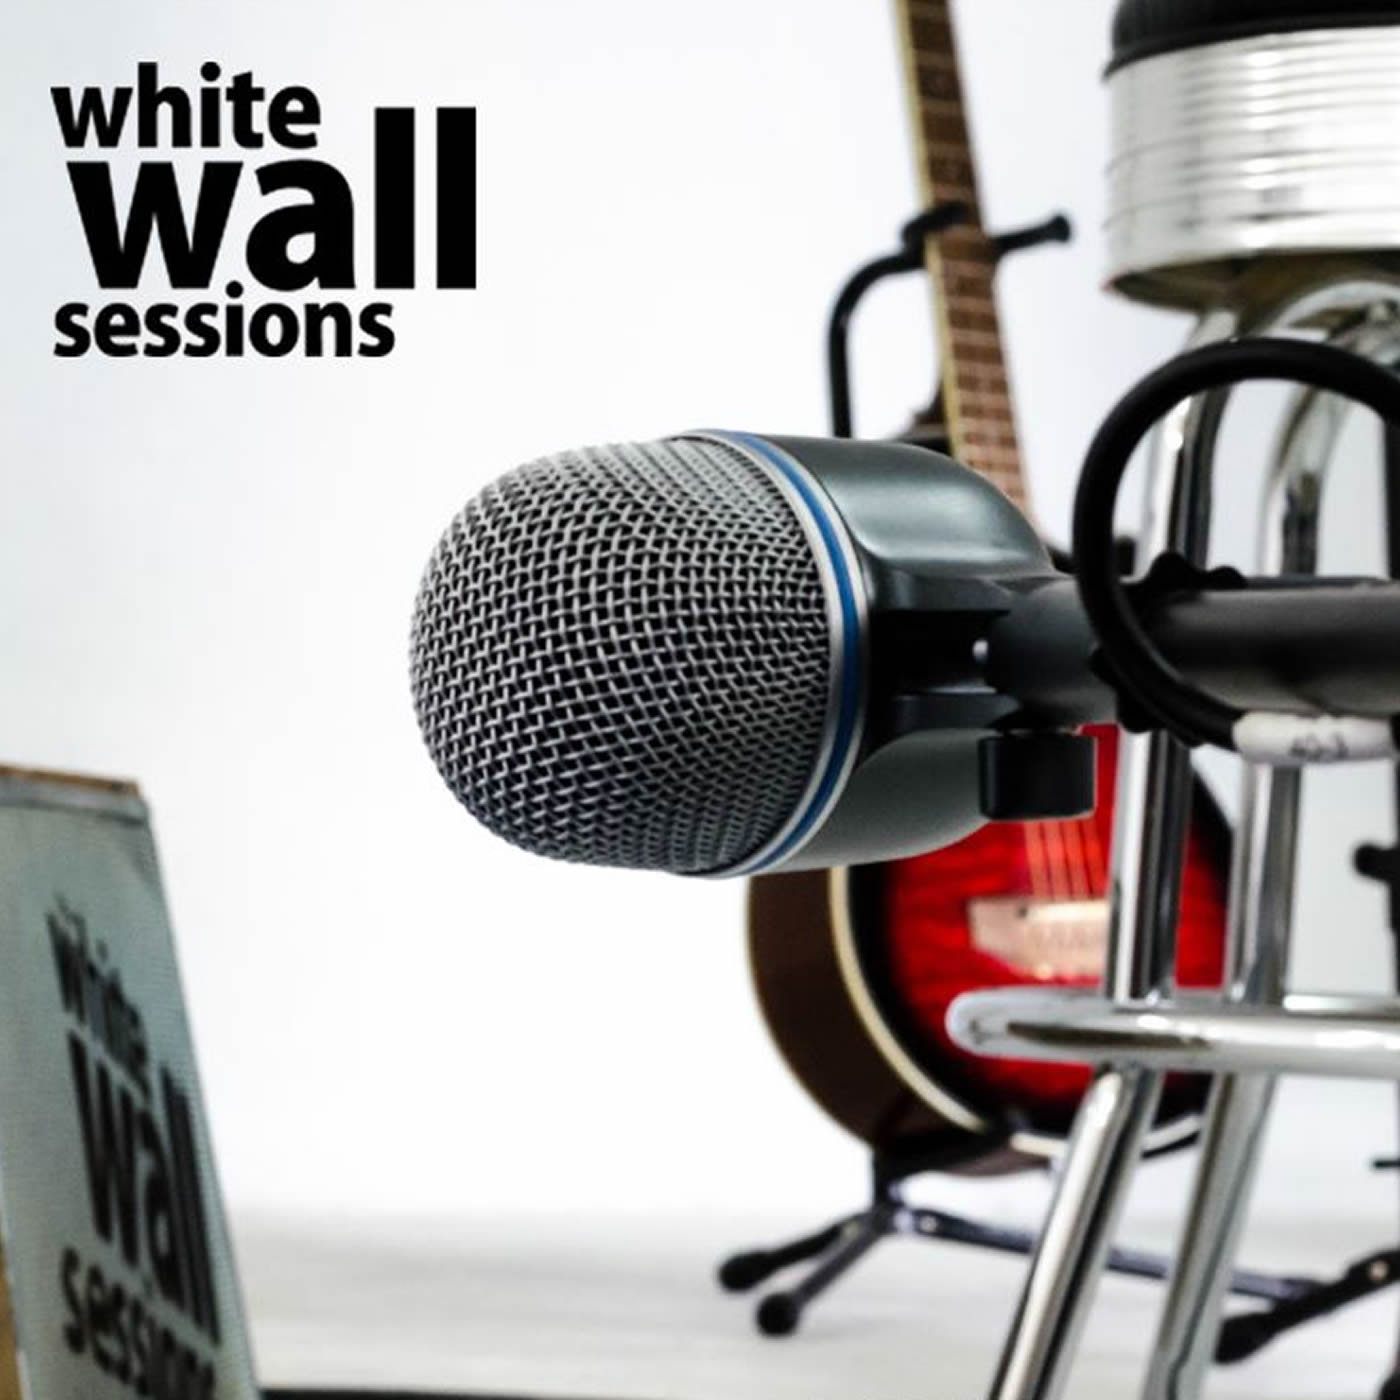 white wall sessions radio show art